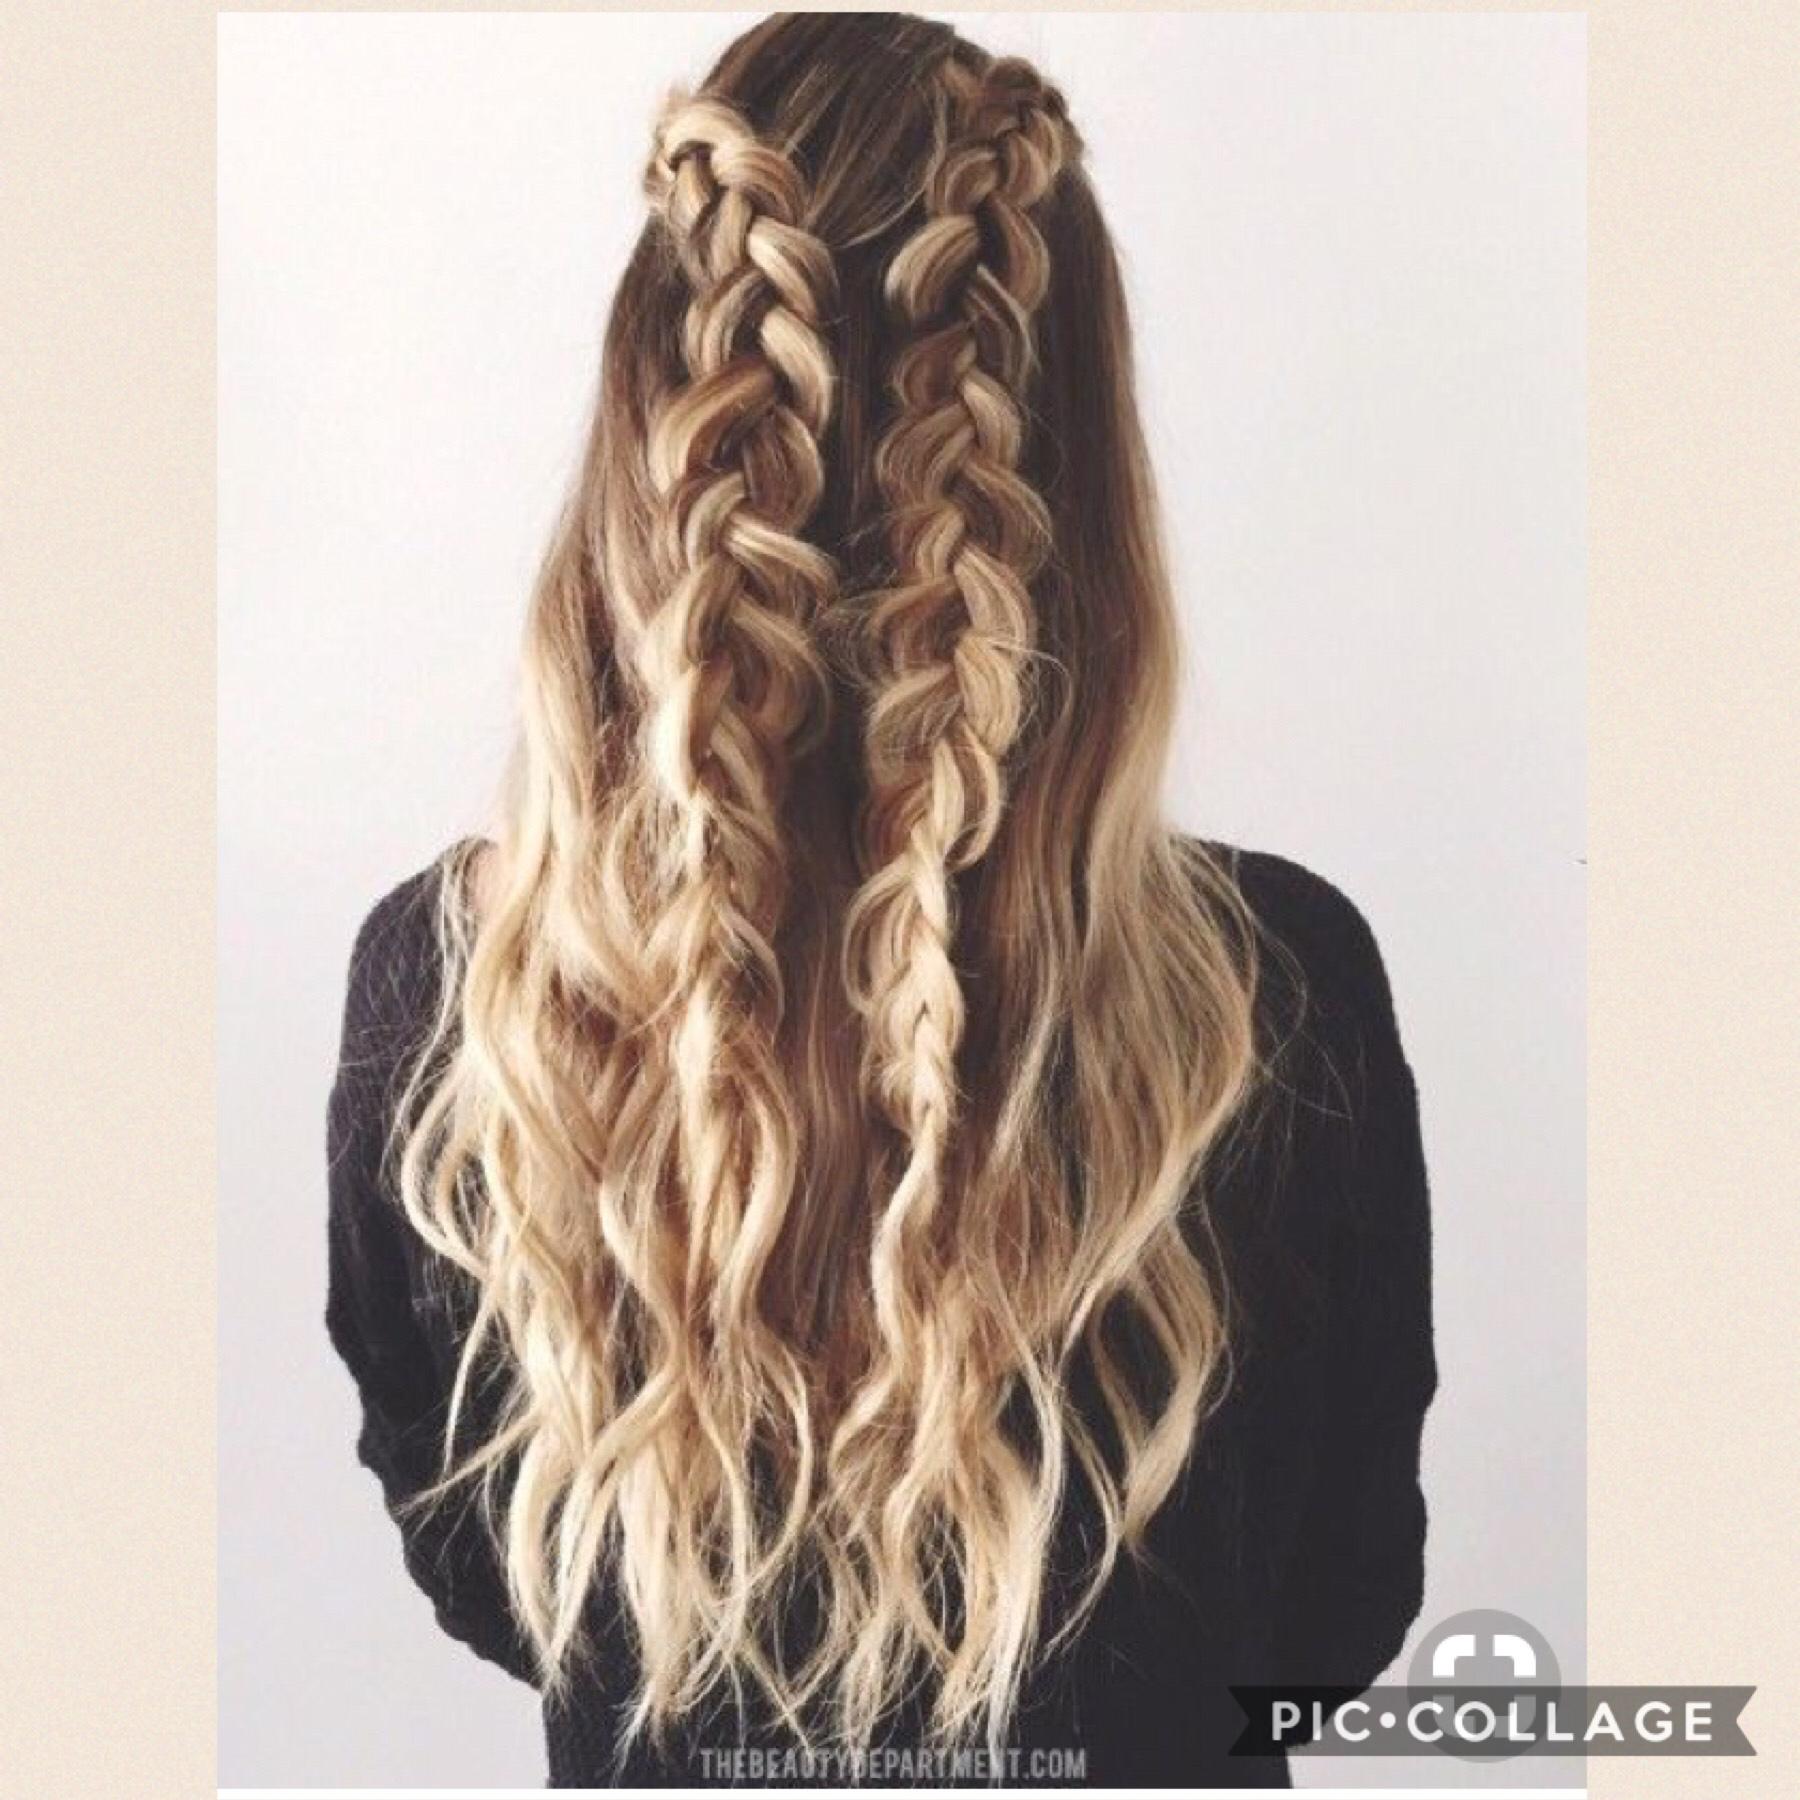 Adorable hair style💜